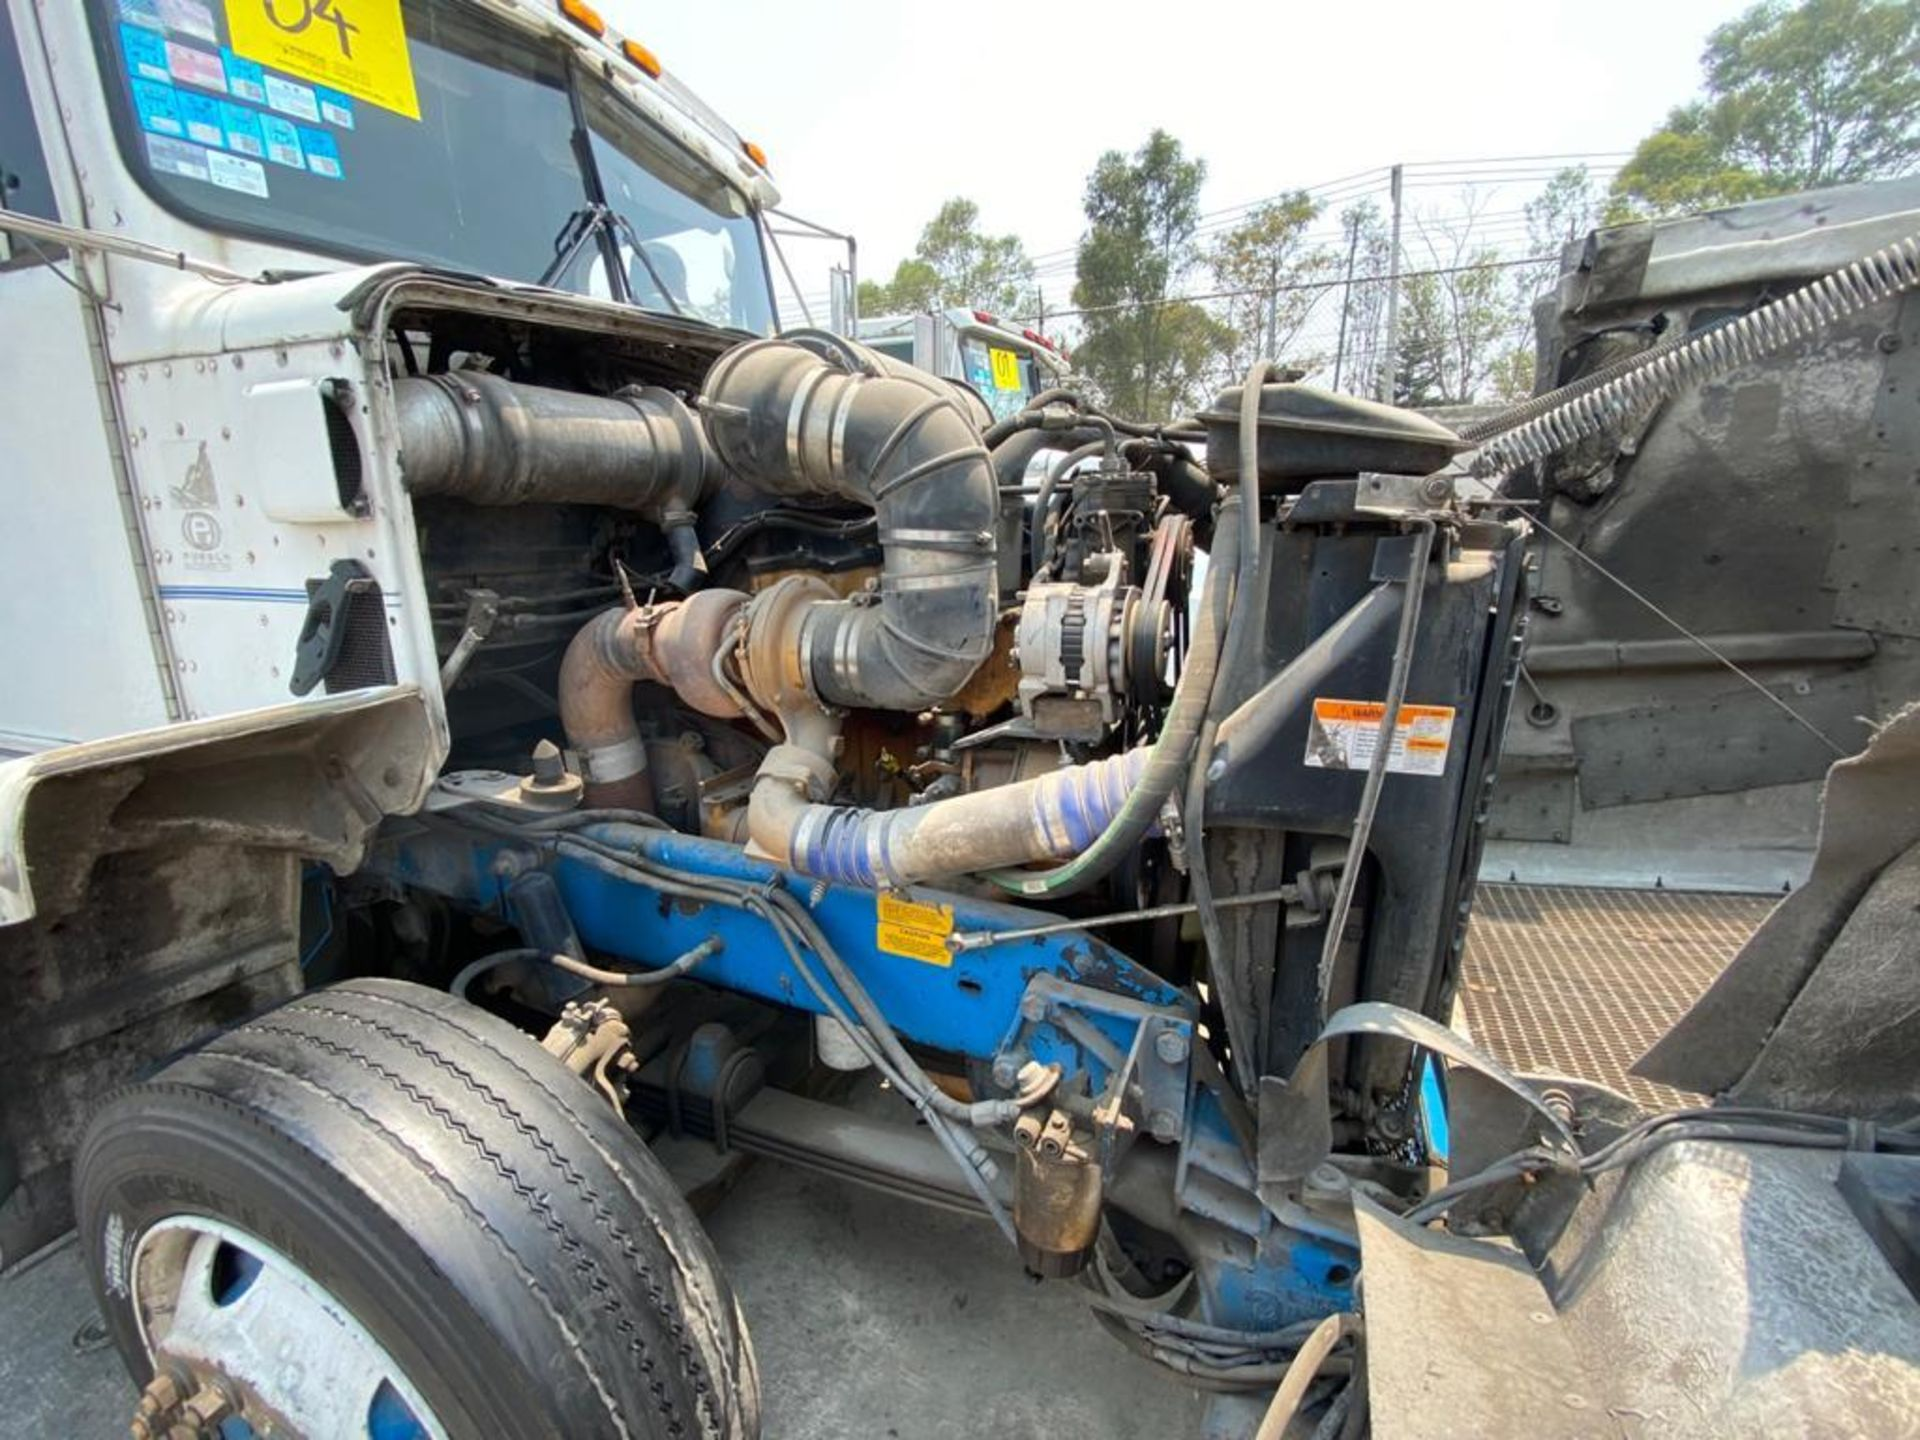 1999 Kenworth Sleeper truck tractor, standard transmission of 18 speeds - Image 61 of 70